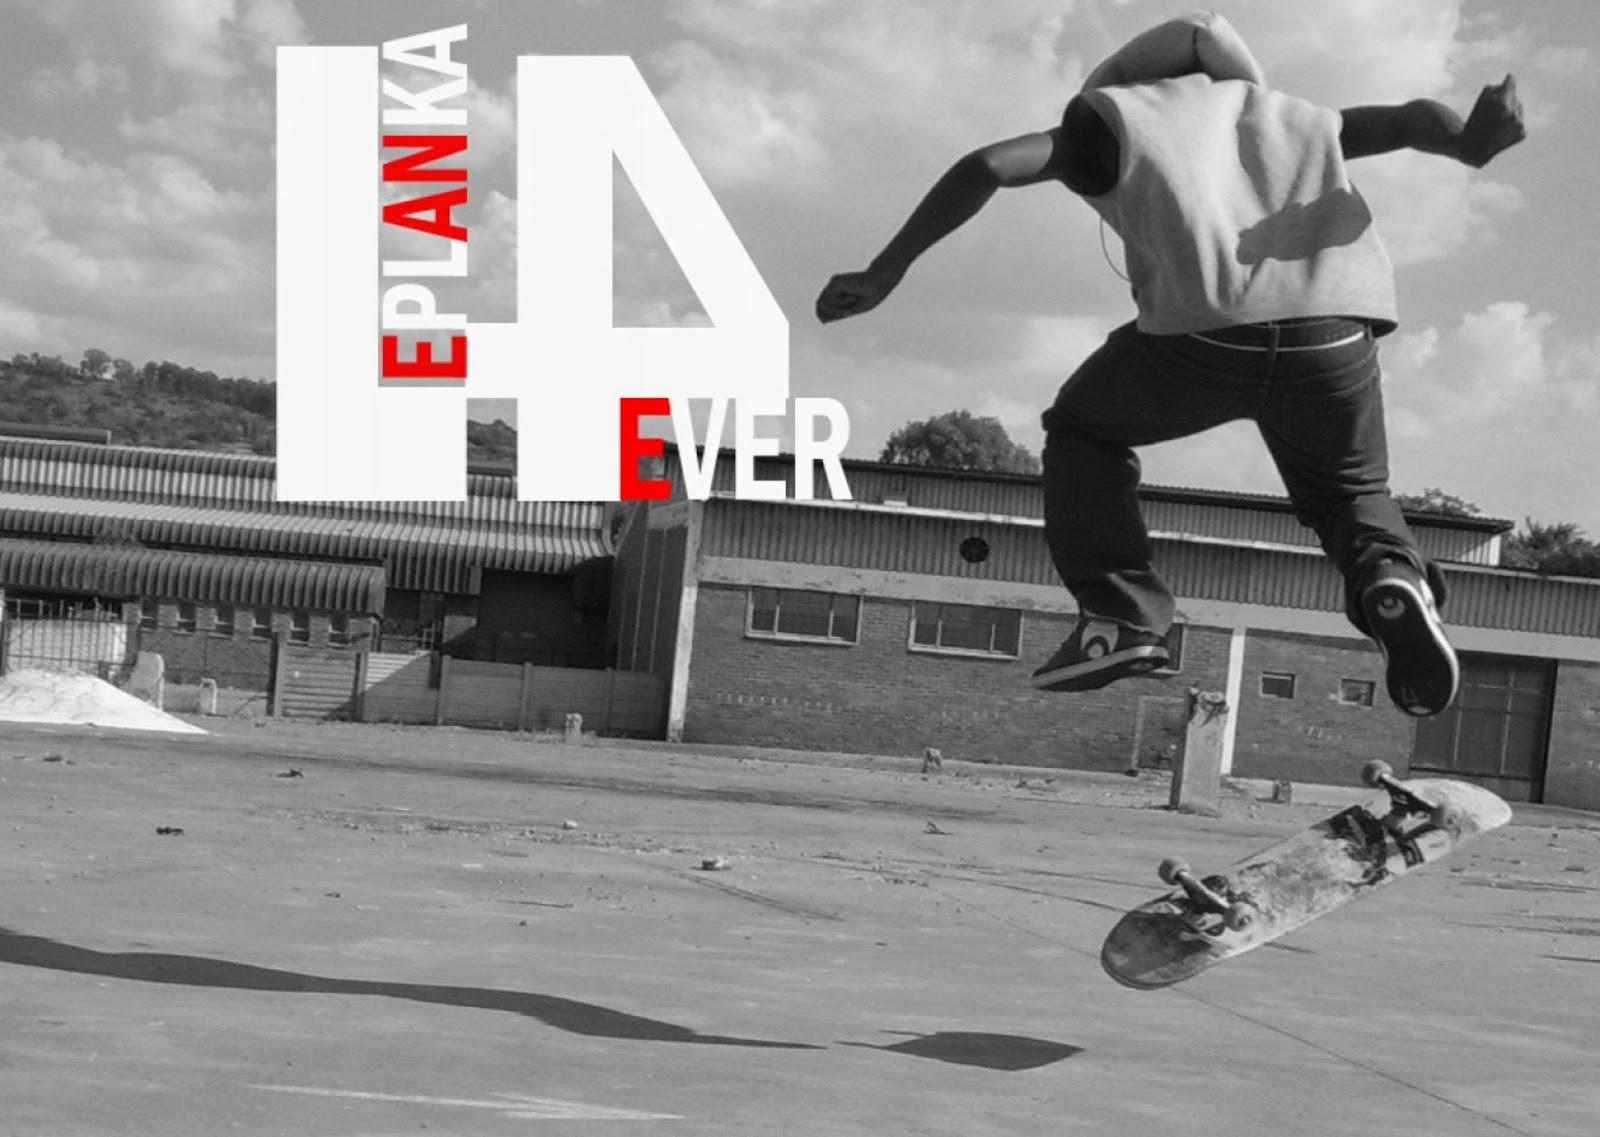 Skateboard Trick Jump Skateboard Wallpapers | Free ...